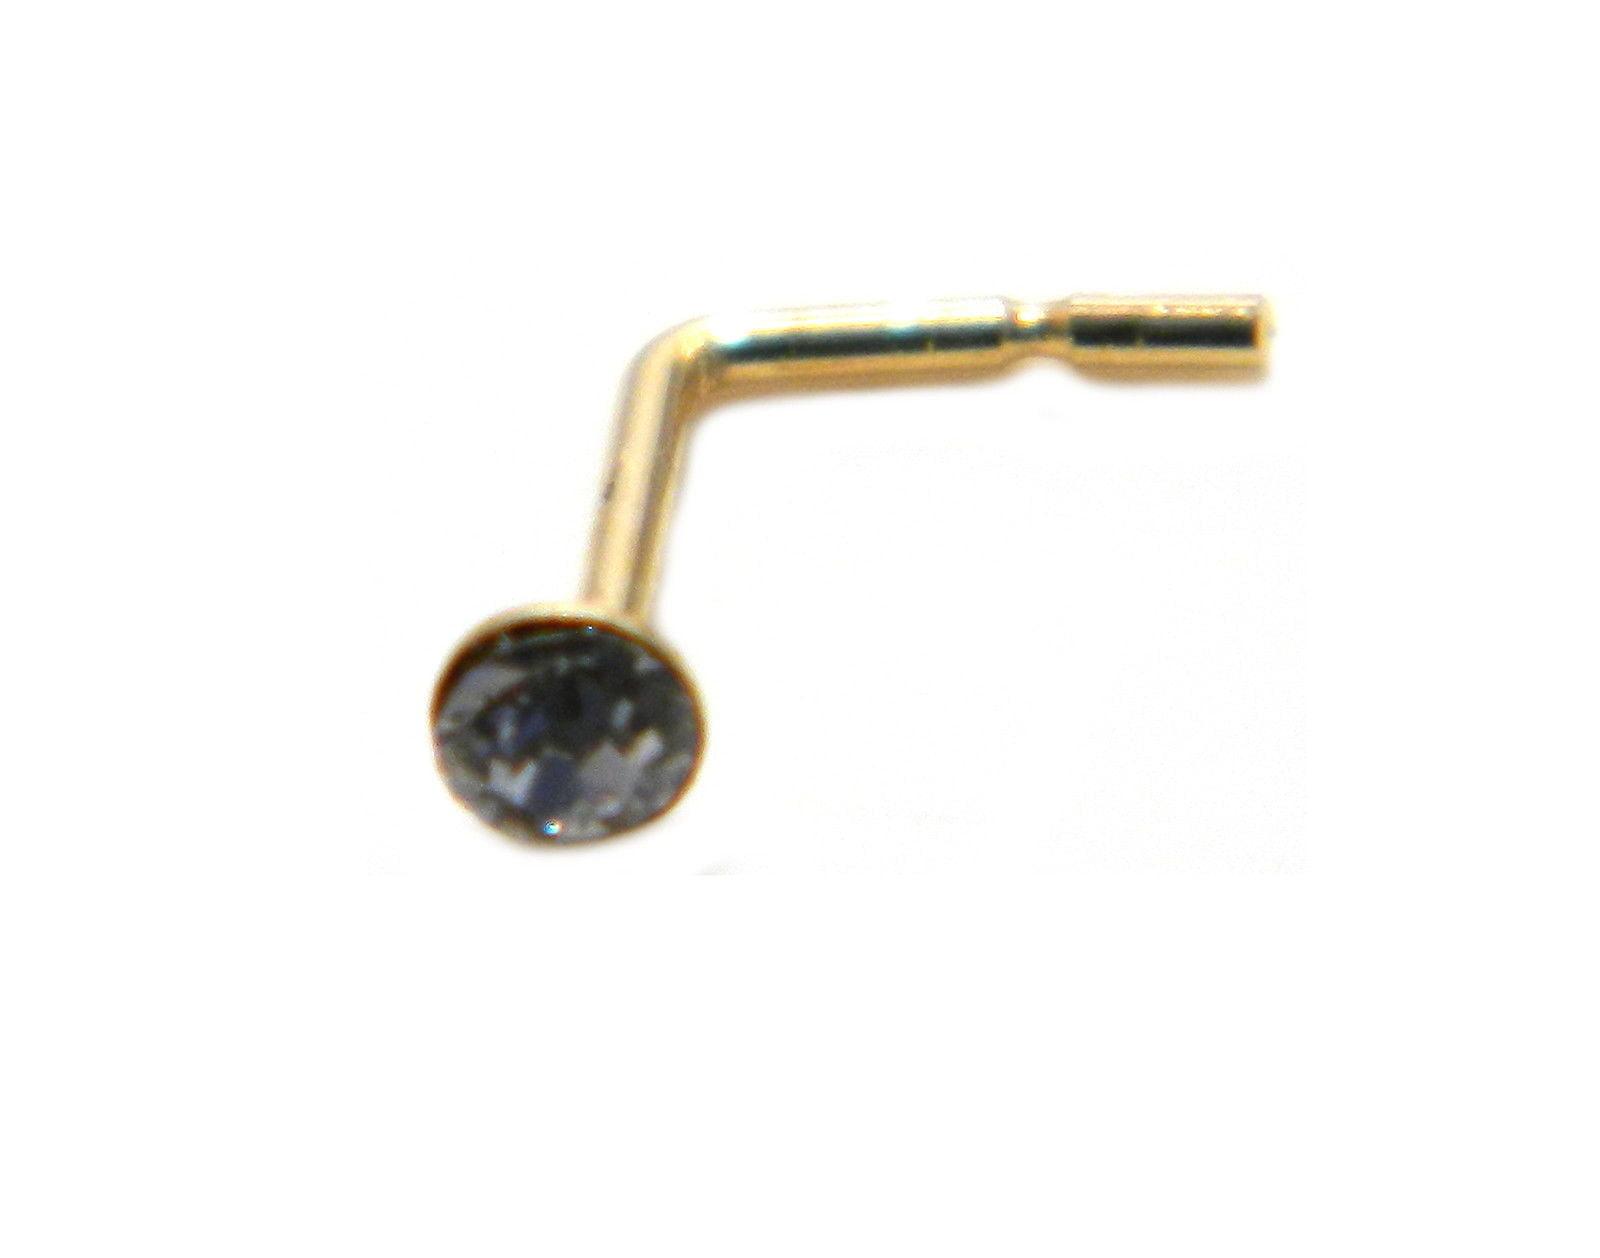 arranview jewellery 2 mm clear austrian crystal nose stud. Black Bedroom Furniture Sets. Home Design Ideas